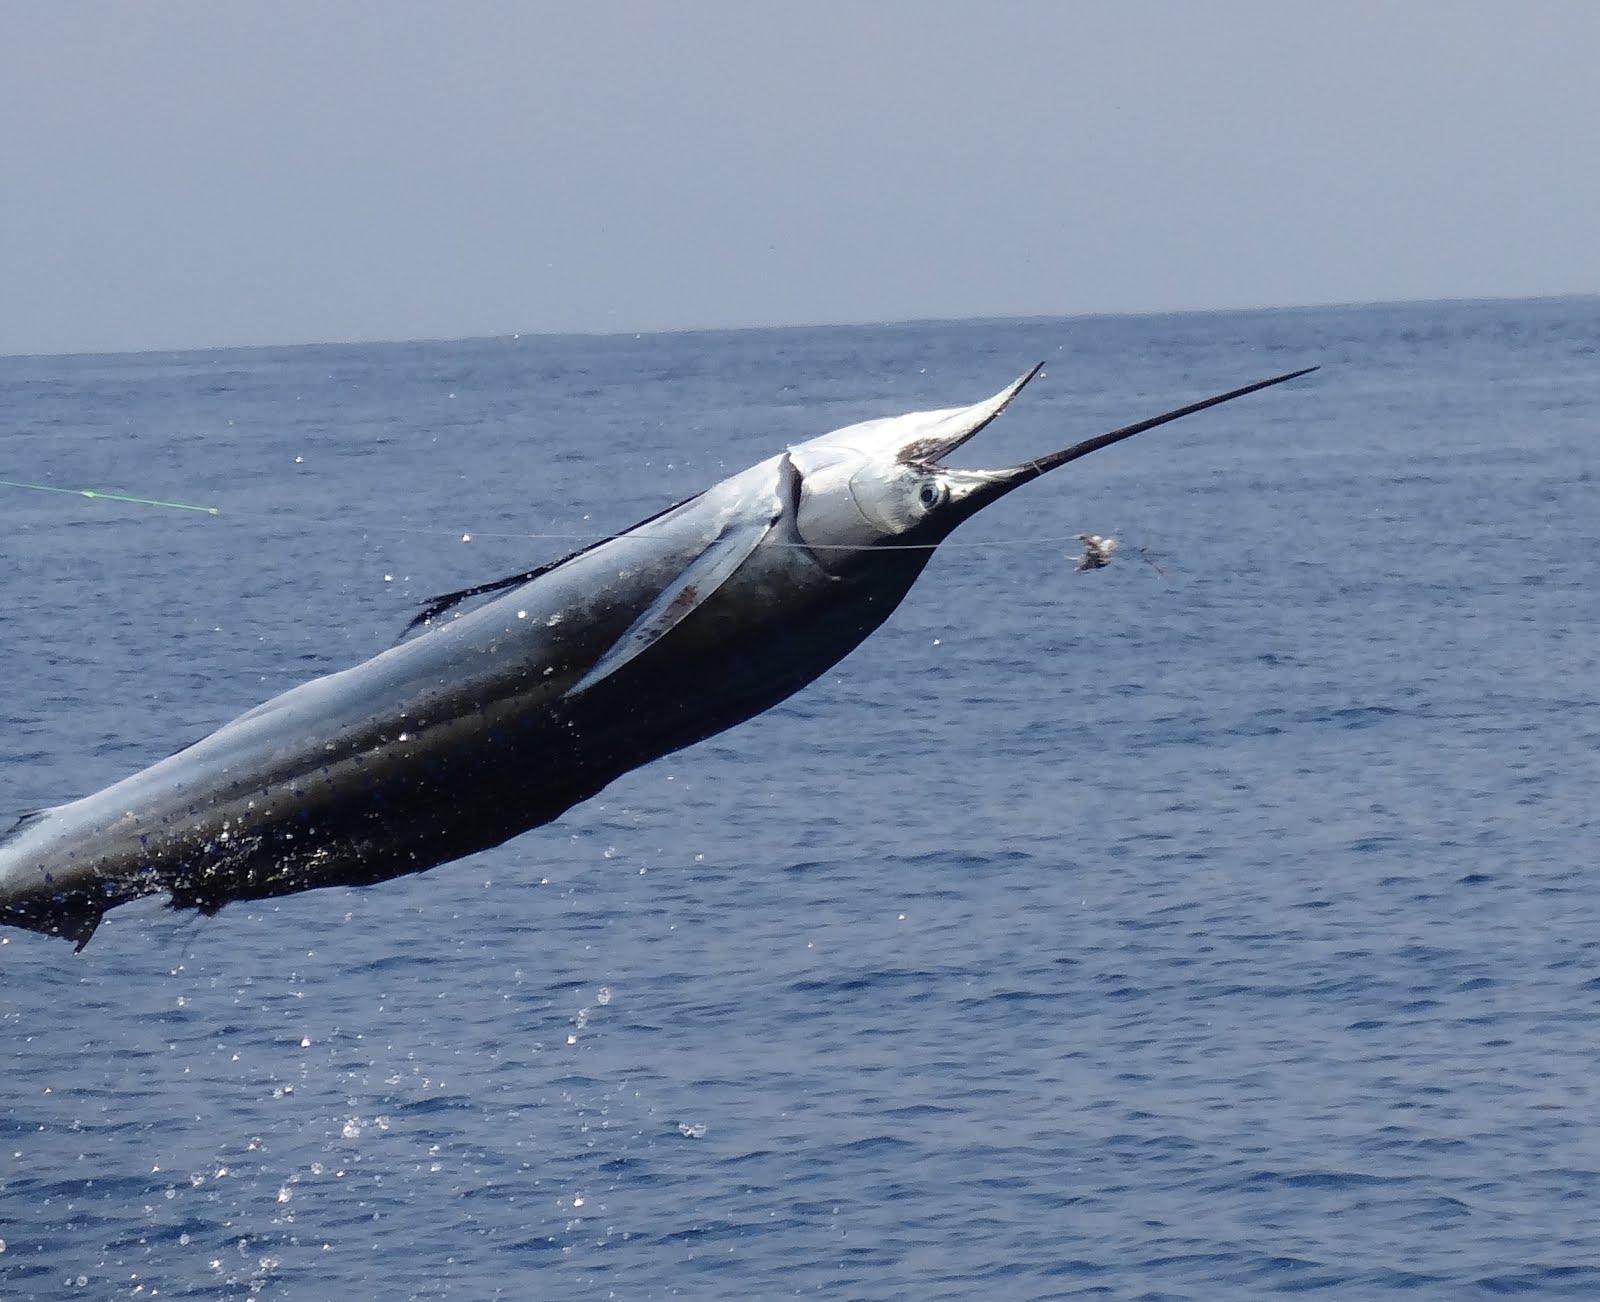 Mad marlin lodge sailfish marlin fishing charters for Marlin fishing charters